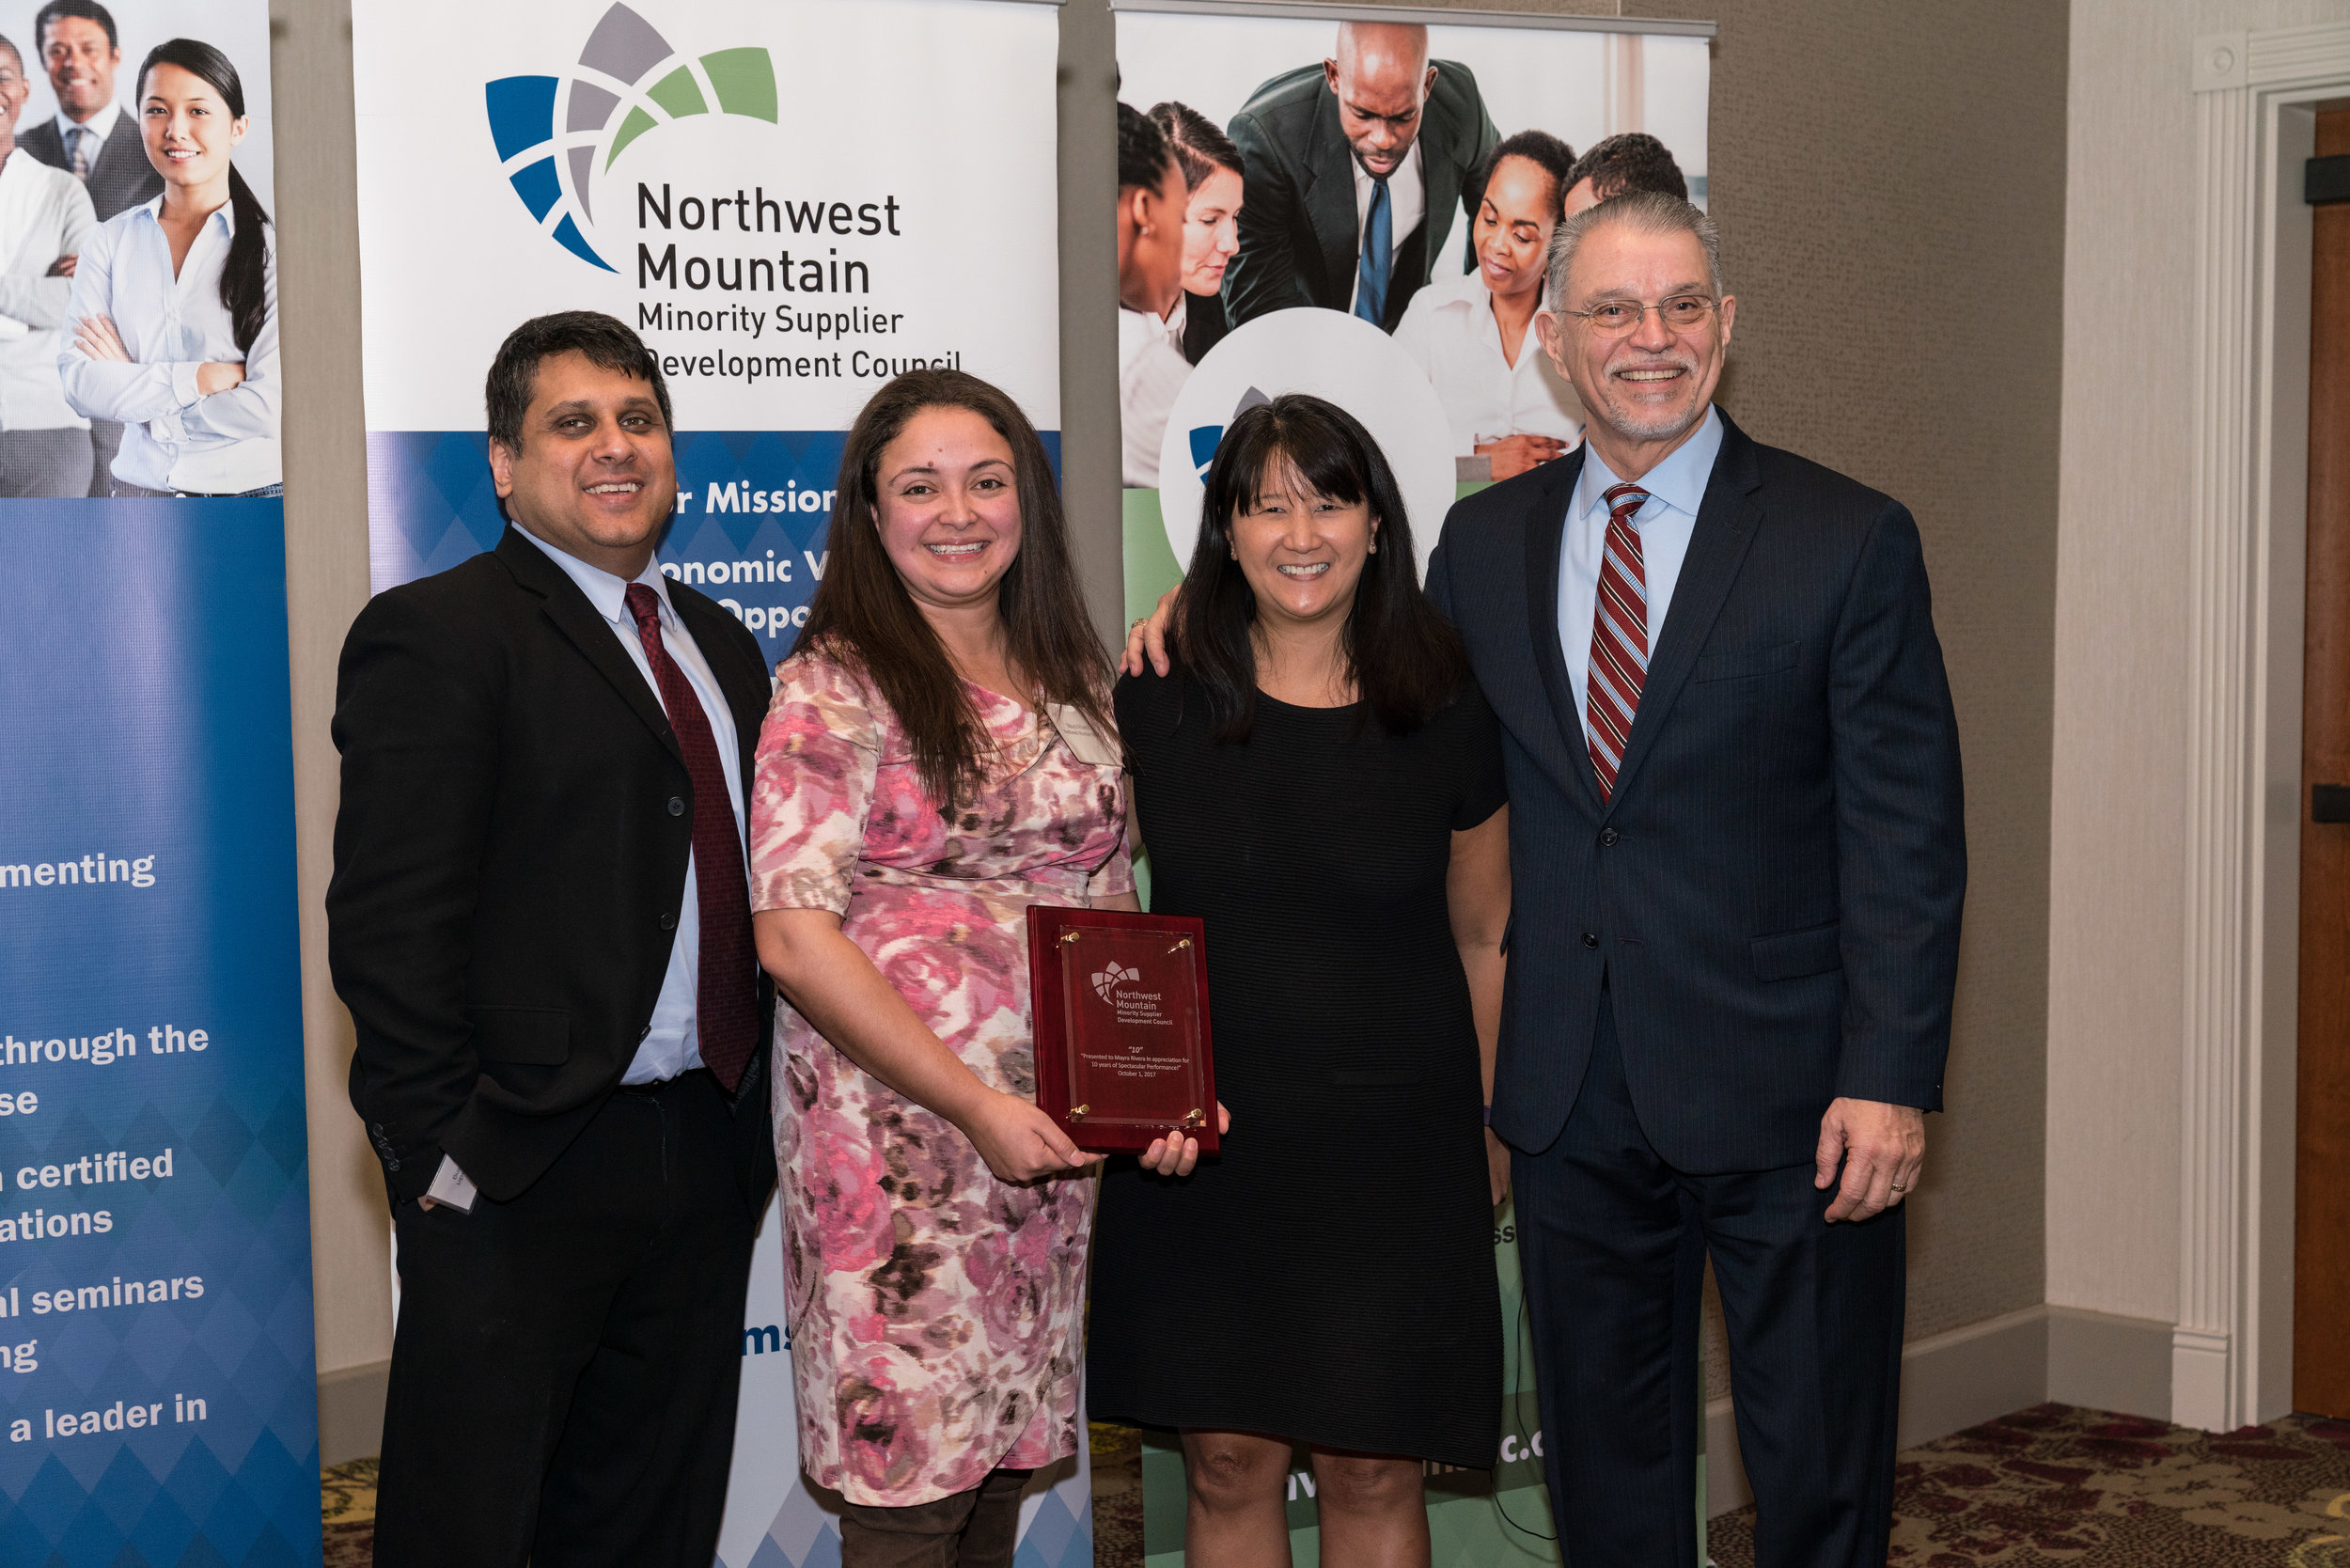 Shahzad Q. Qadri, Wong Fleming; Mayra Rivera, Northwest Mountain MSDC; Diane Lin, Starbucks Corporation; and Fernando Martinez, Northwest Mountain MSDC